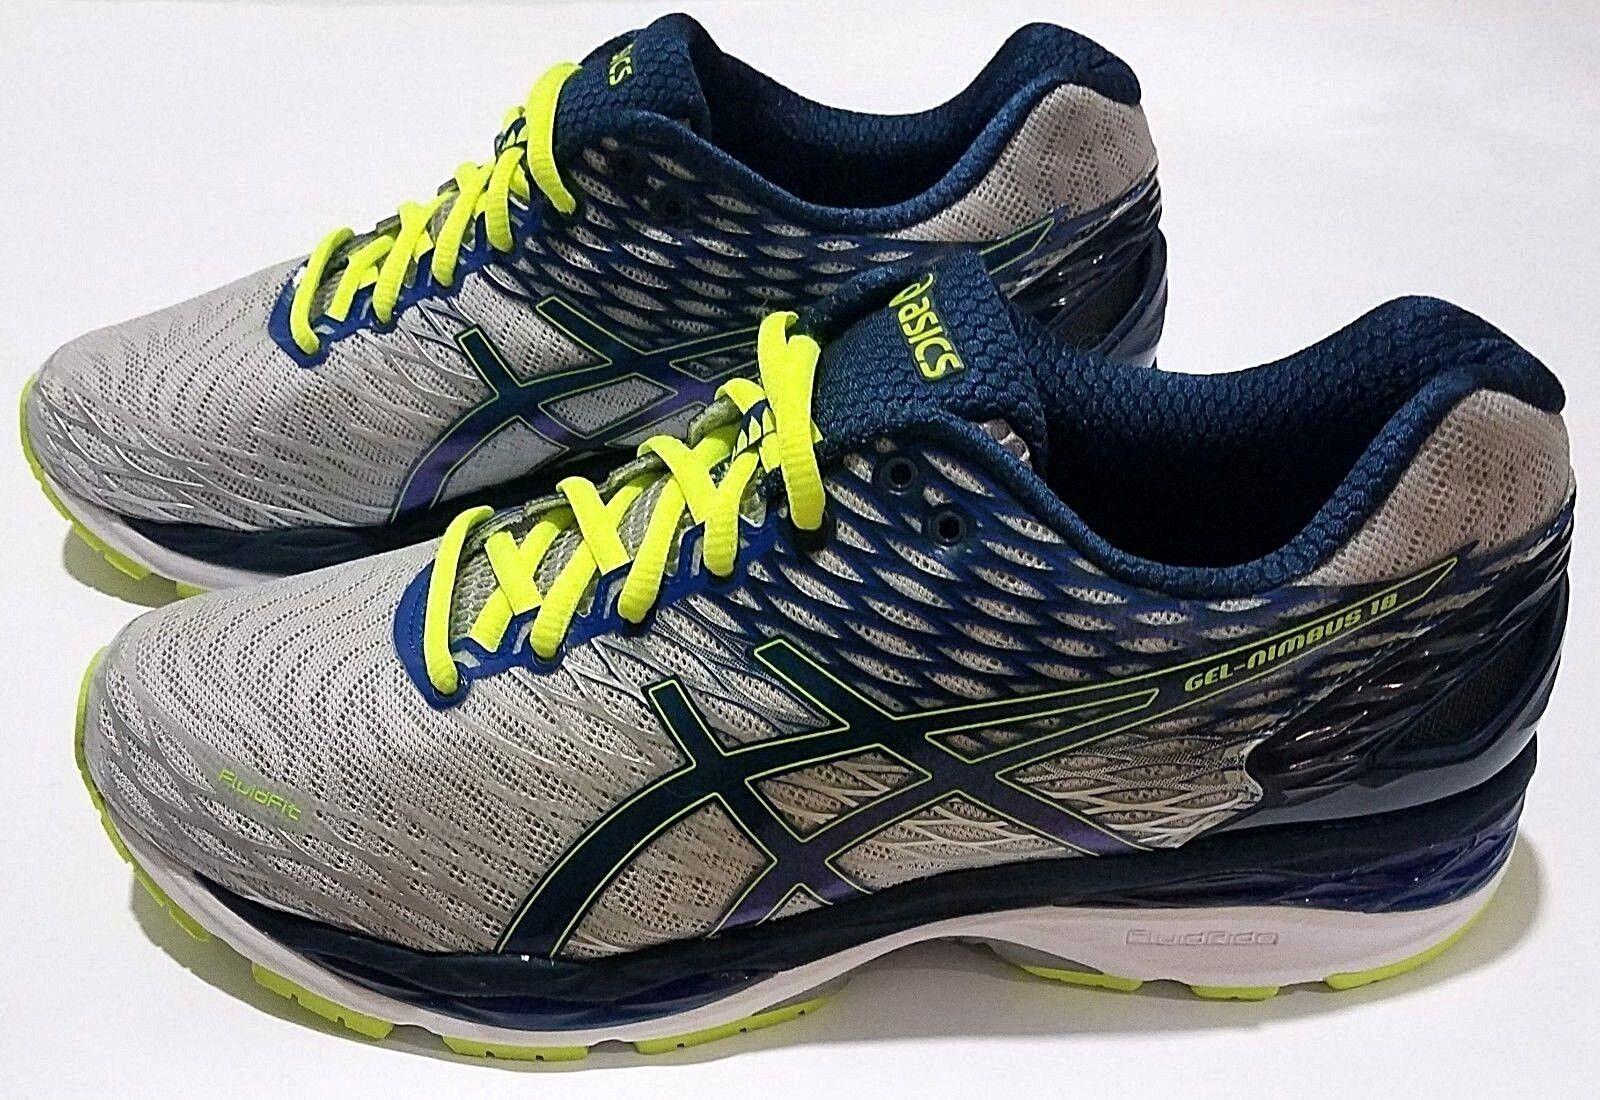 Asics Gel Nimbus 18 Mens Running shoes T600N Silver Ink Yellow Size 8.5 - 11.5